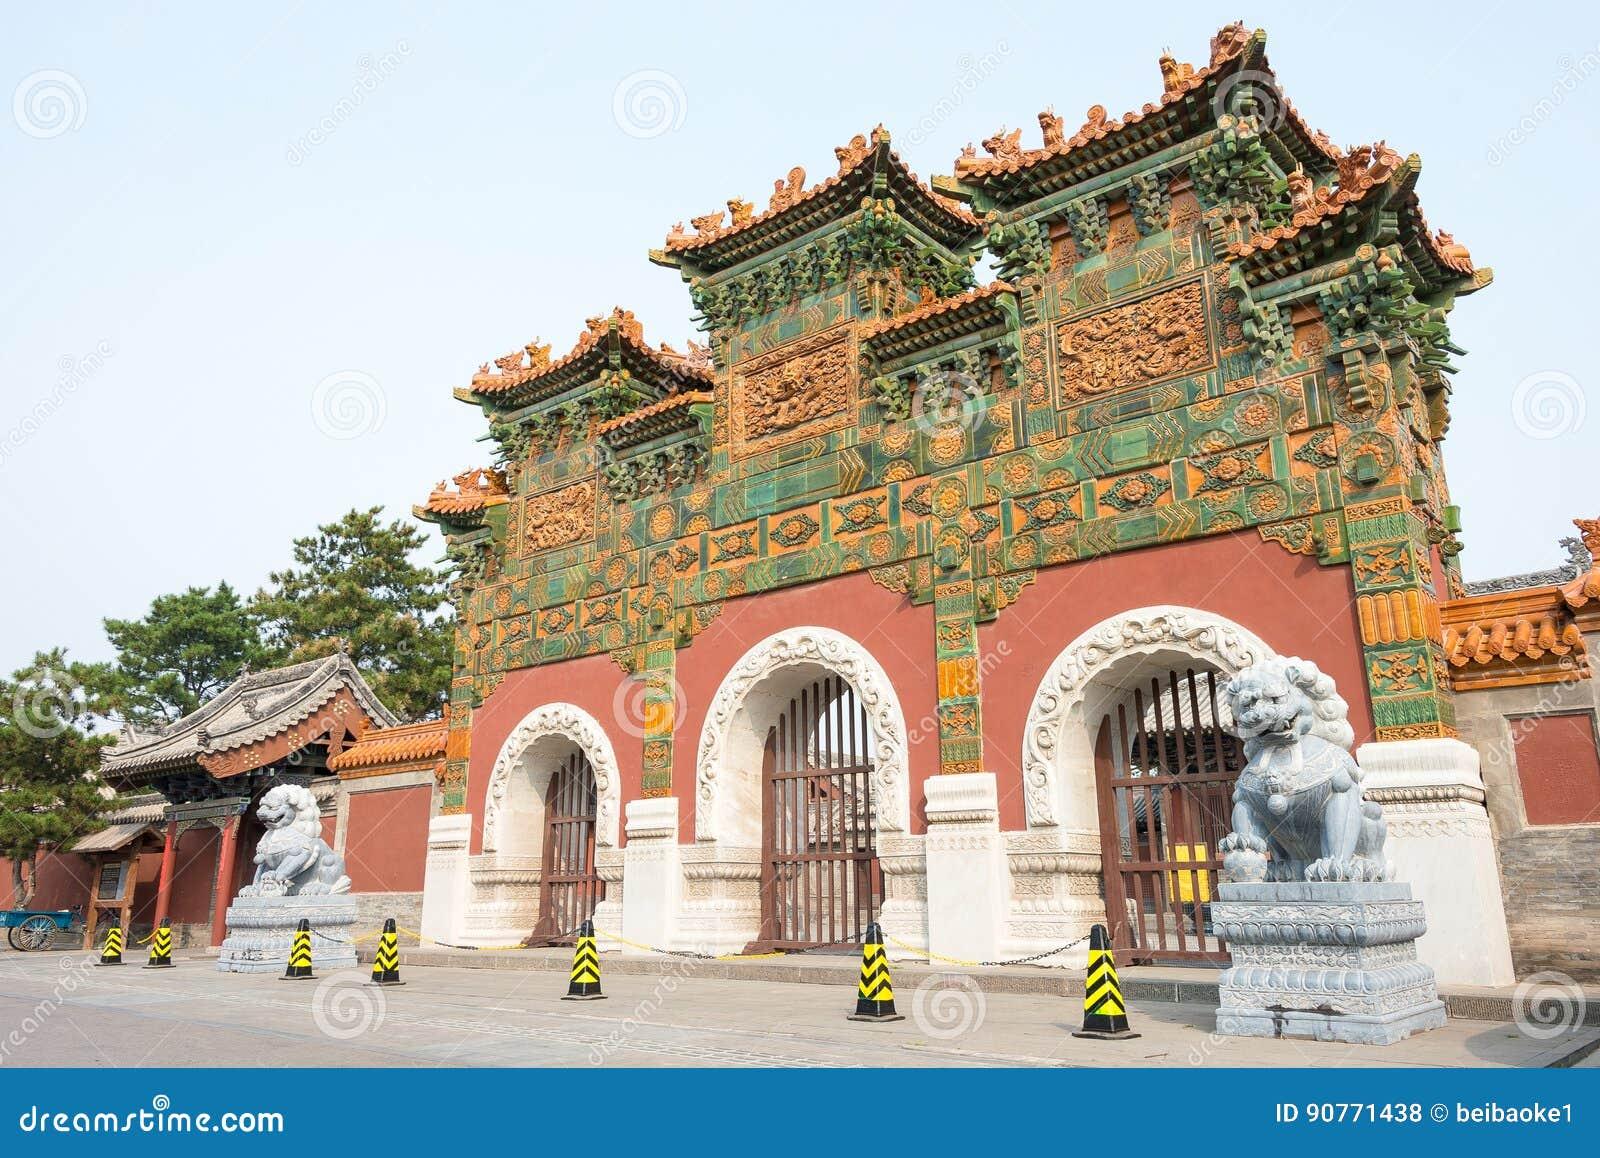 SHANXI, CHINA - Sept 21 2015: Fahua Temple. a famous historic s